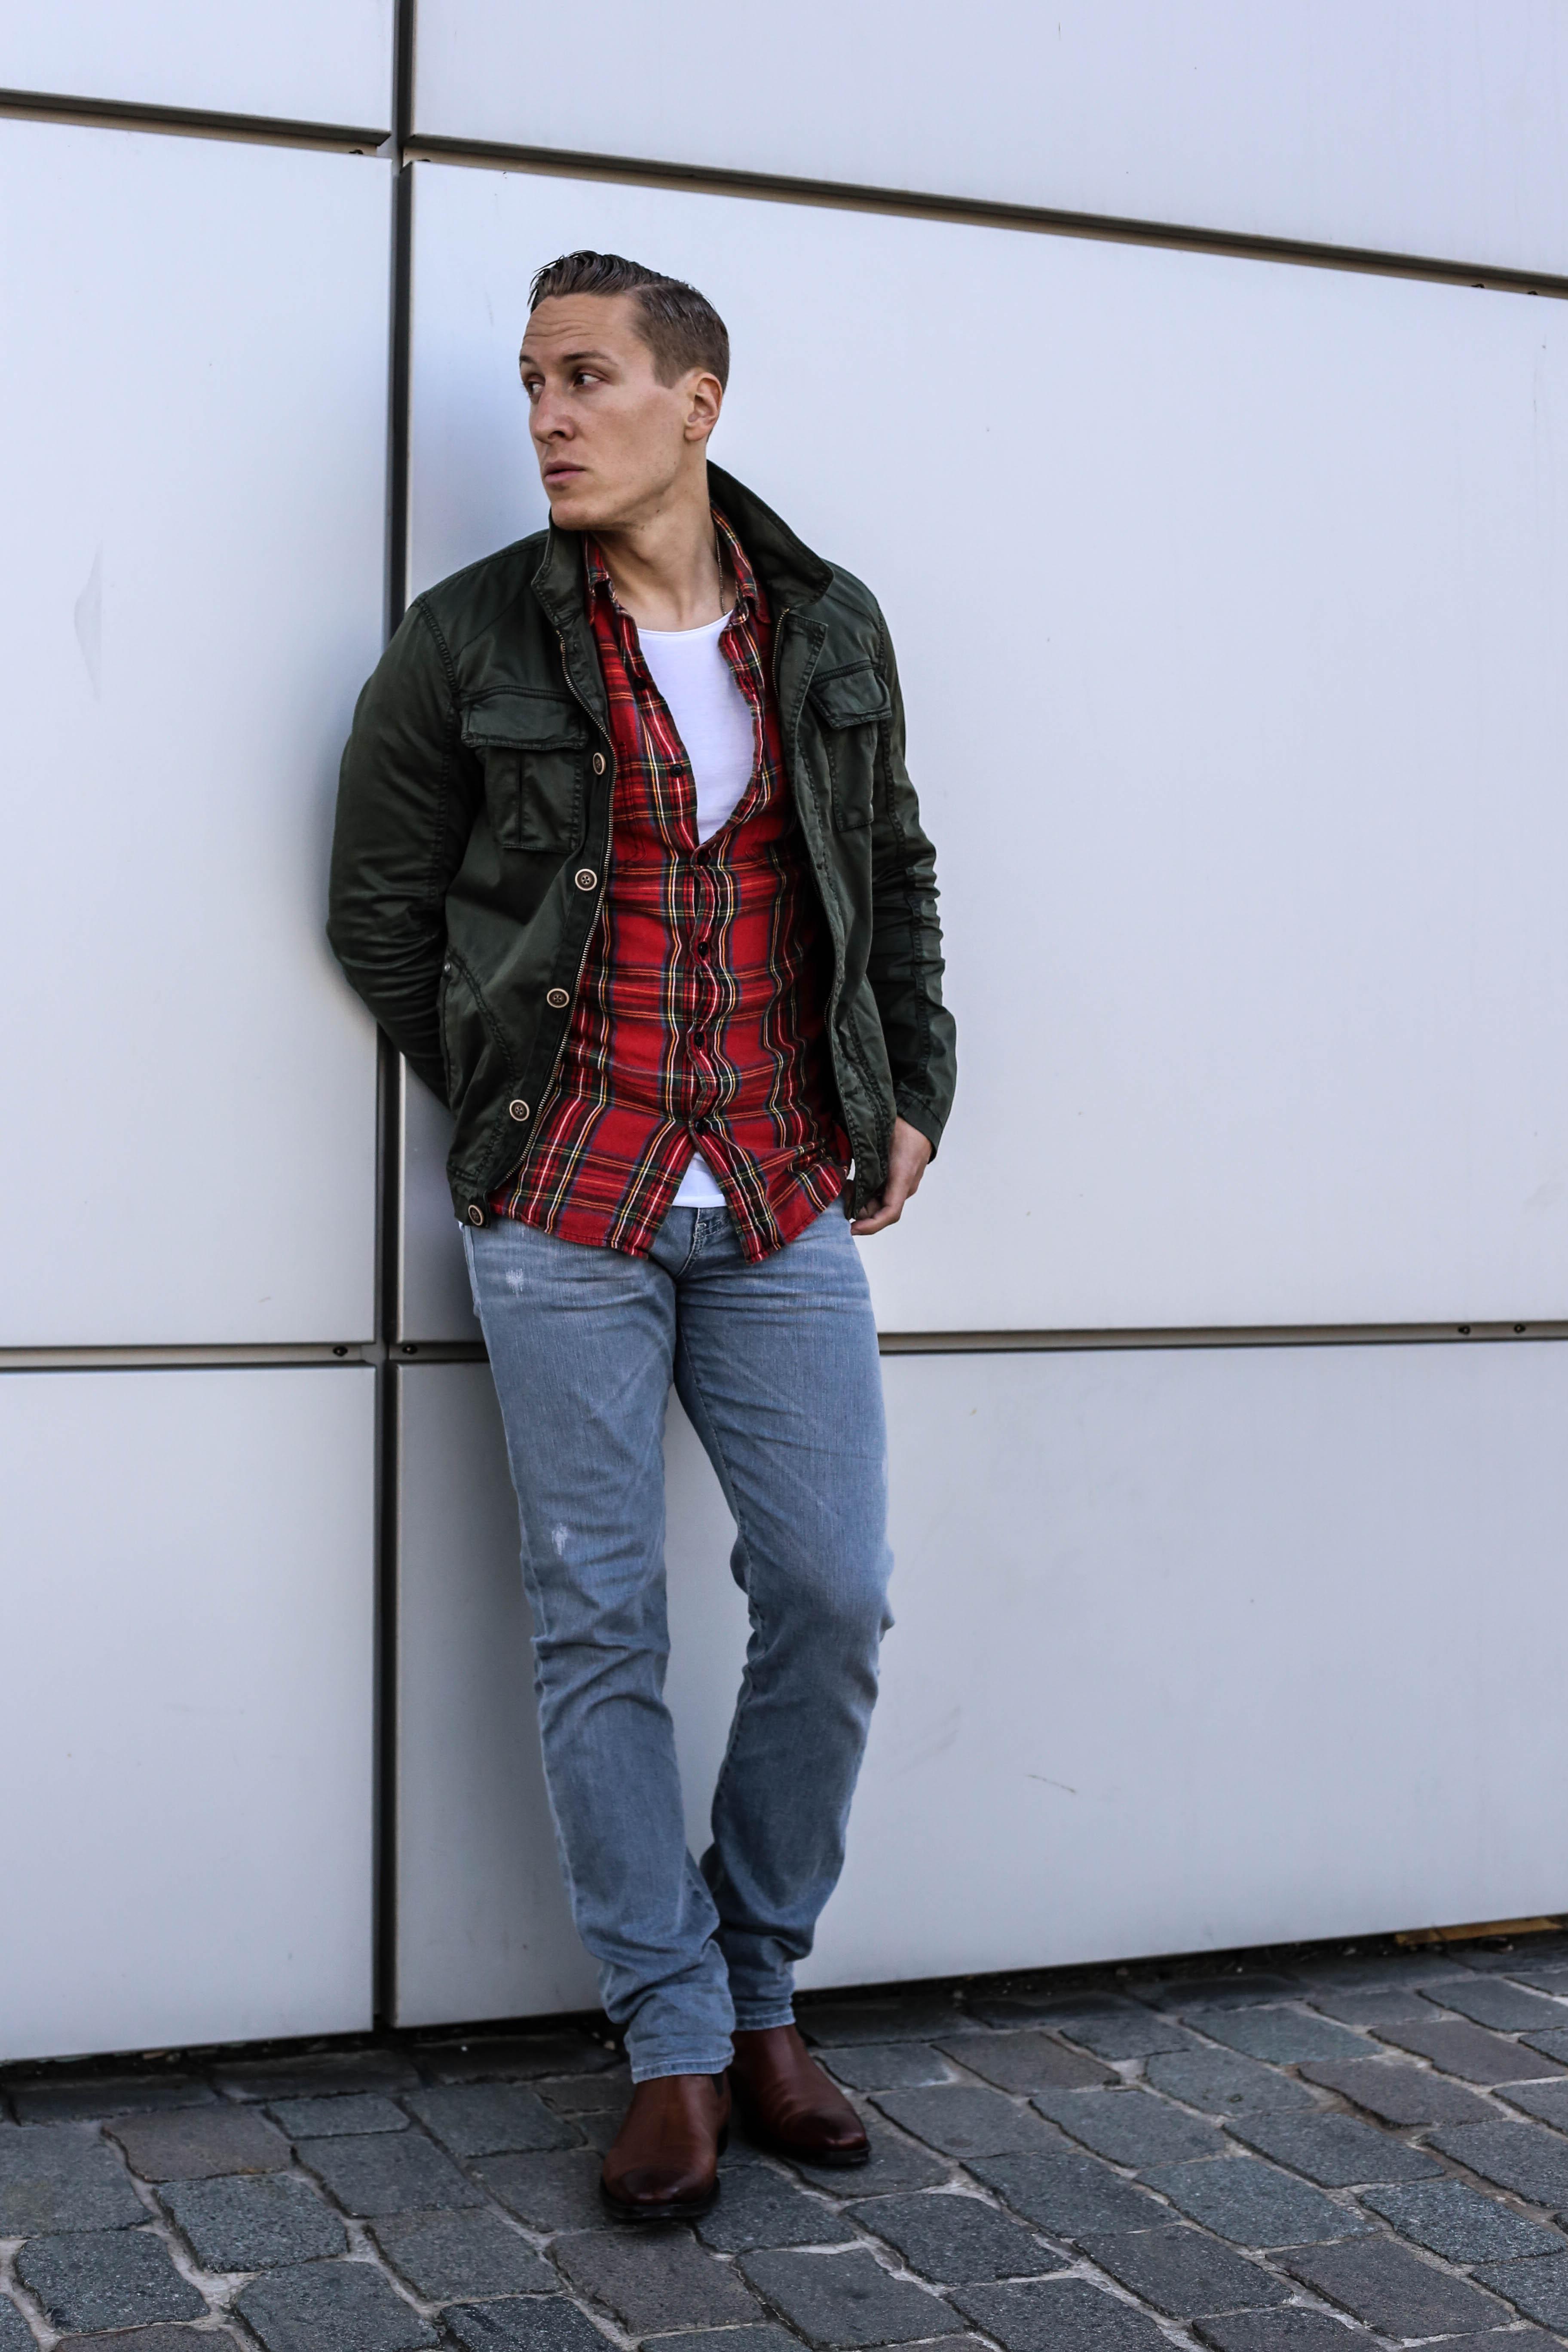 kariertes-hemd-skinny-jeans-fashionblog-menfashion-chelsea-boots-gruener-kurz-parka_7498